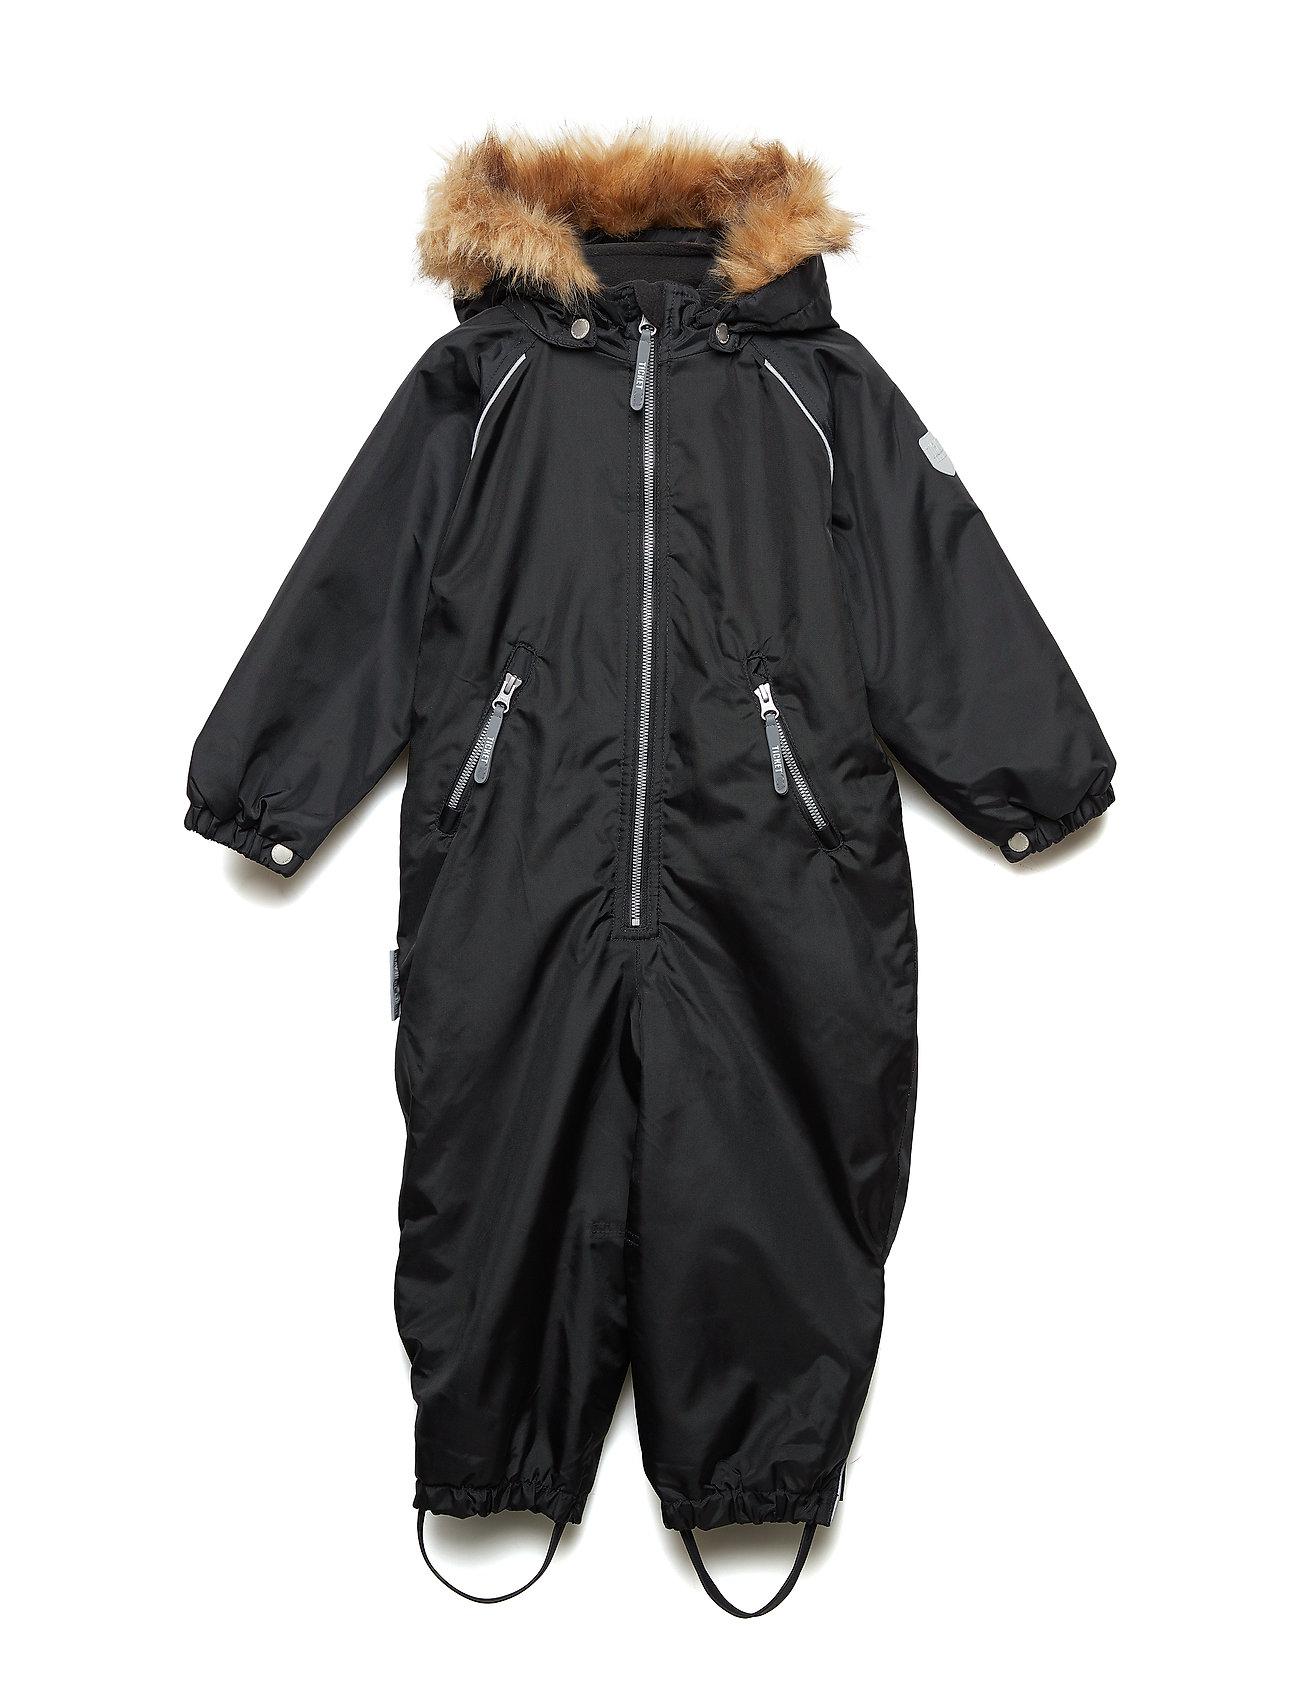 ed4befb4c3e Suit Snowbaggie With Detachable Hood Flyverdragt Overtøj Sort TICKET TO  HEAVEN